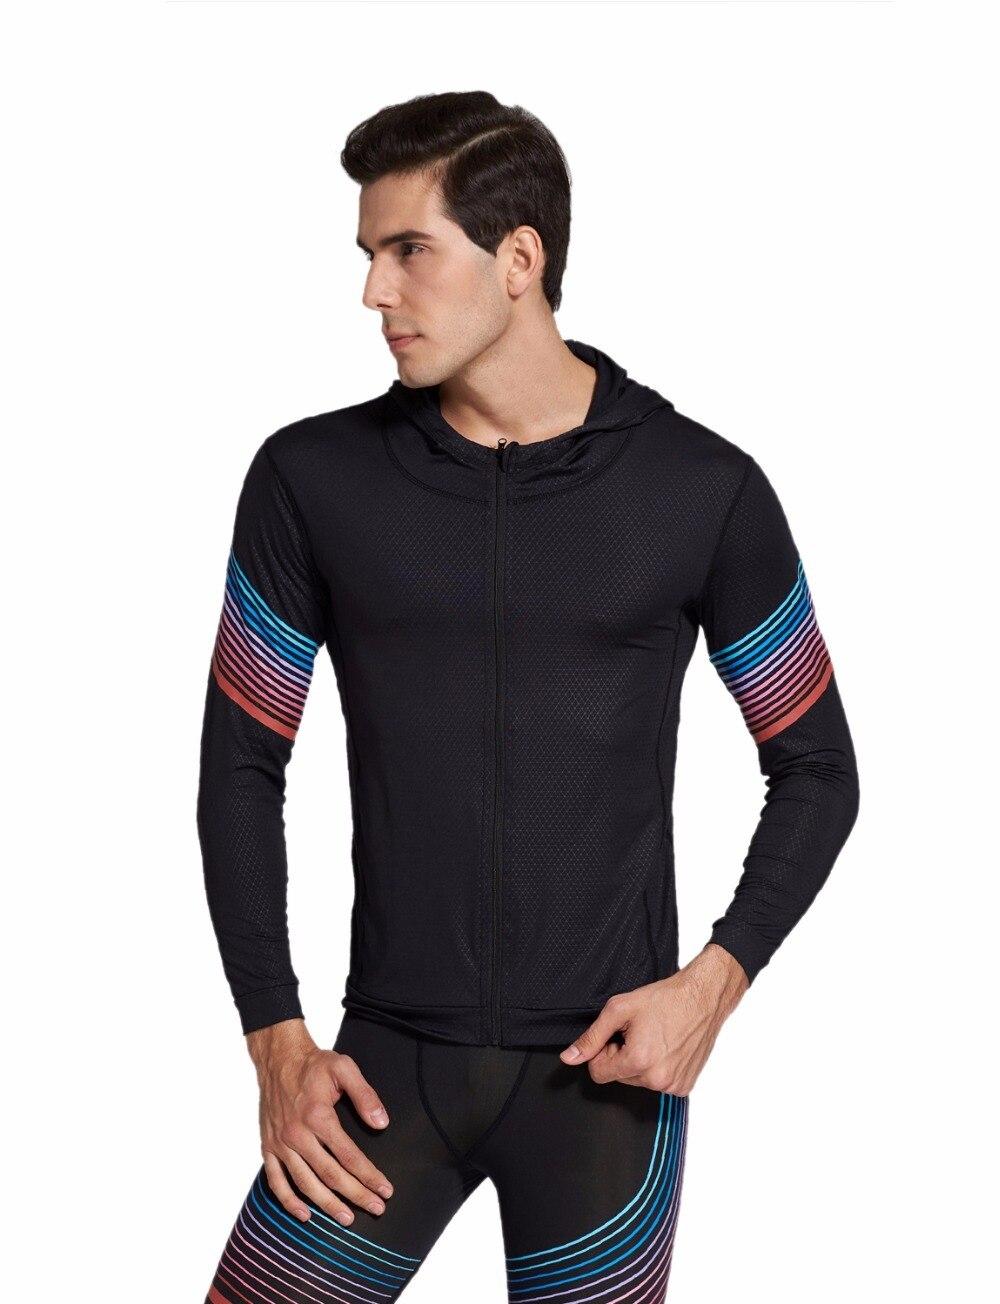 Zielstrebig Vihir Männer Grundlegende Full Zip-up Hoodie-sweatshirt Für Sport üPpiges Design Jacken